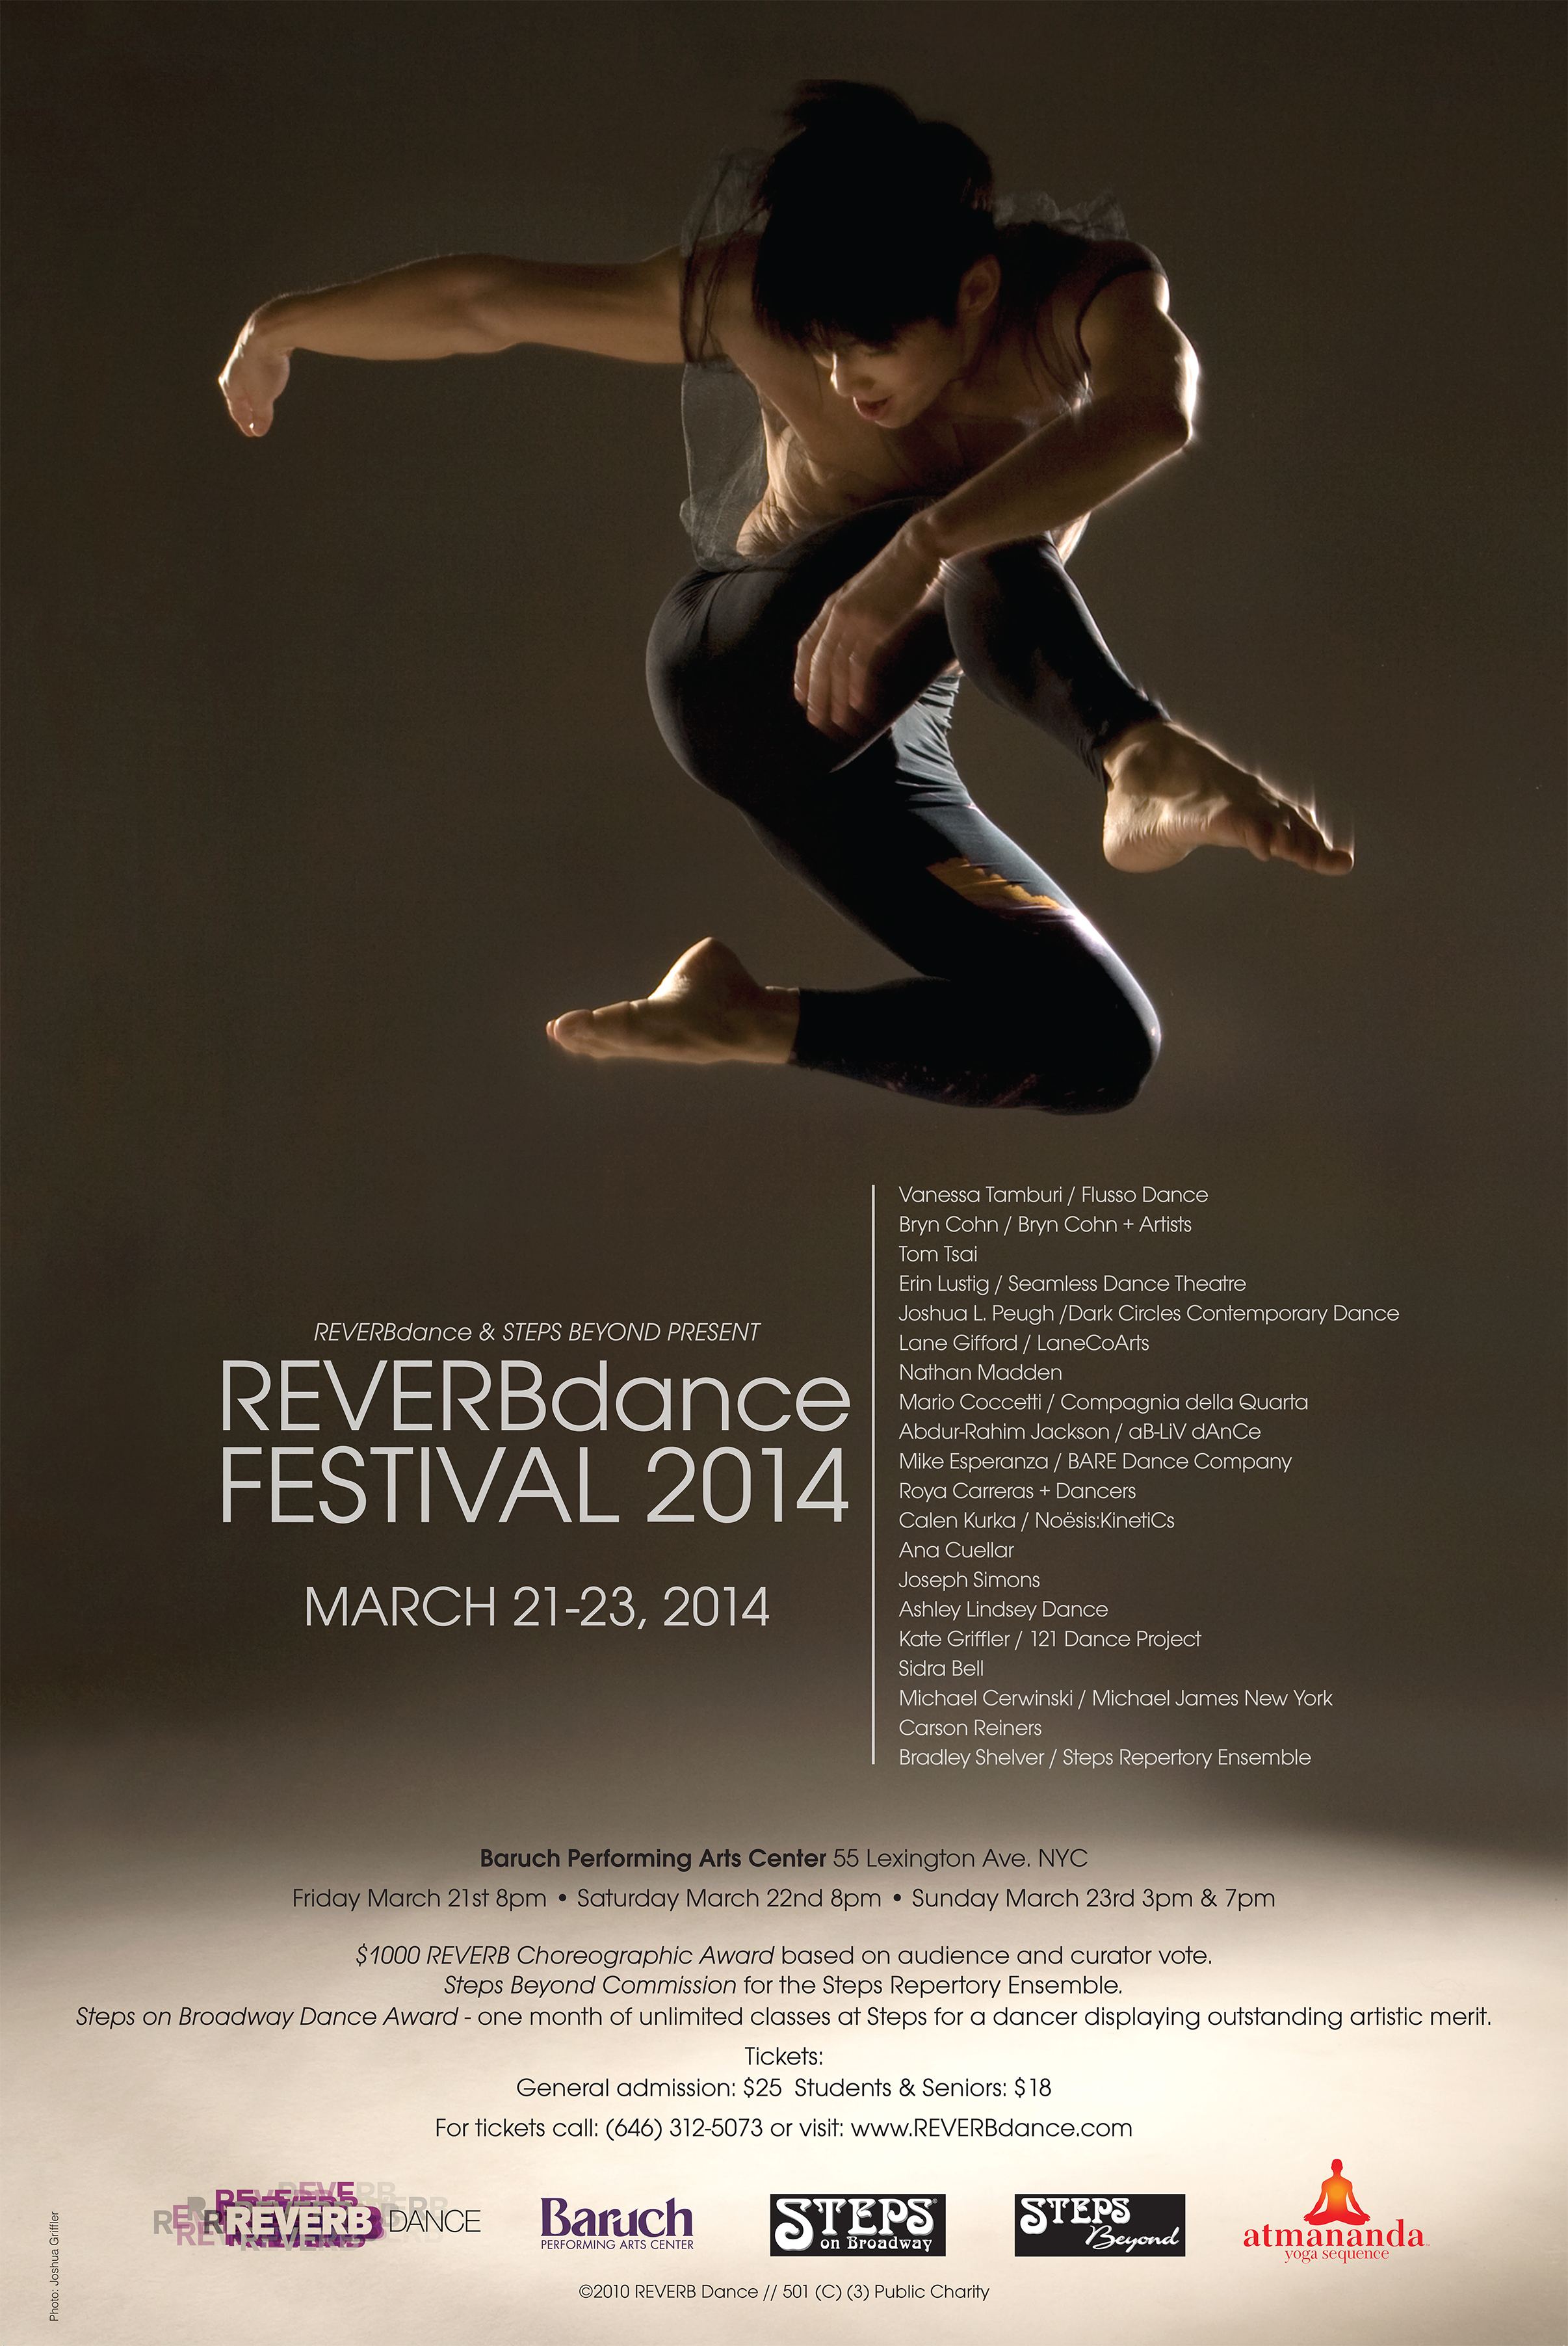 2-17-14 REVERBdance2014pster24-36-lo.jpg